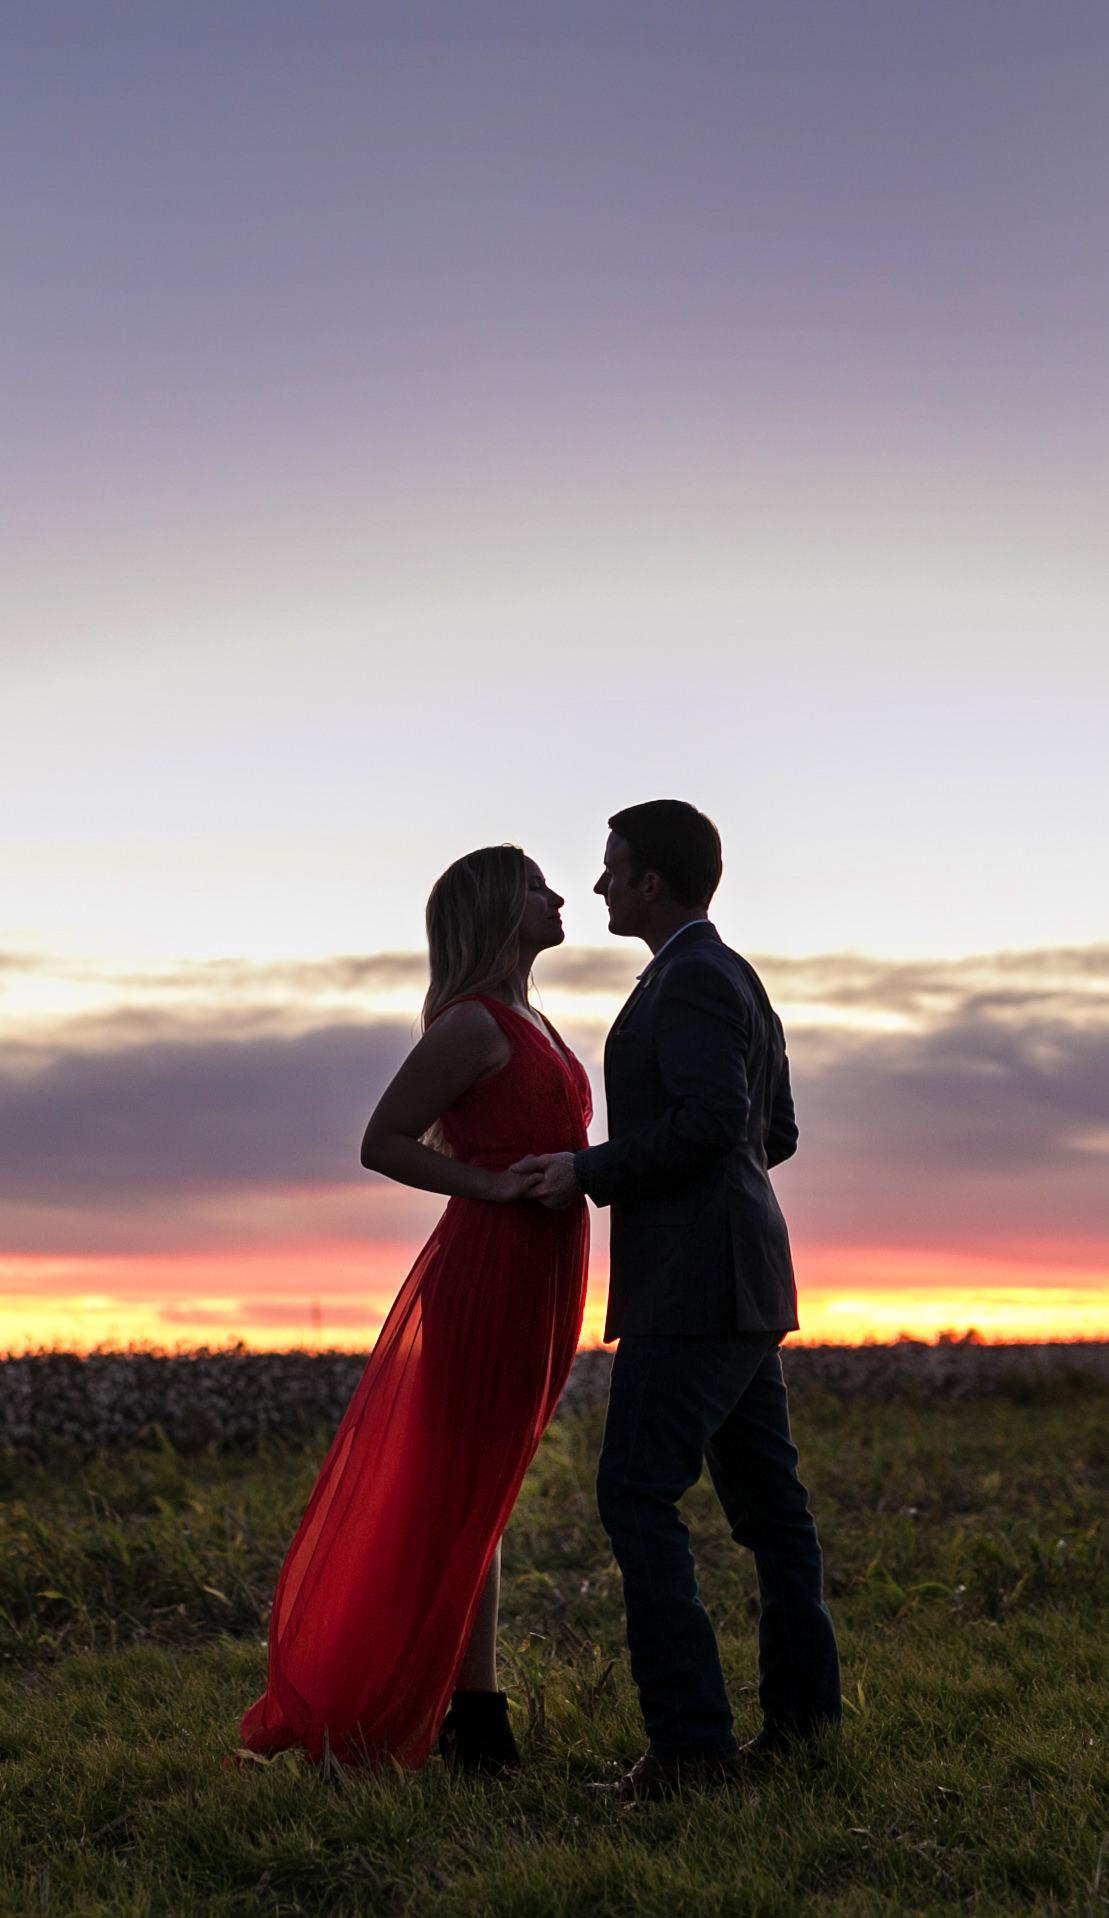 lubbock sunset photo